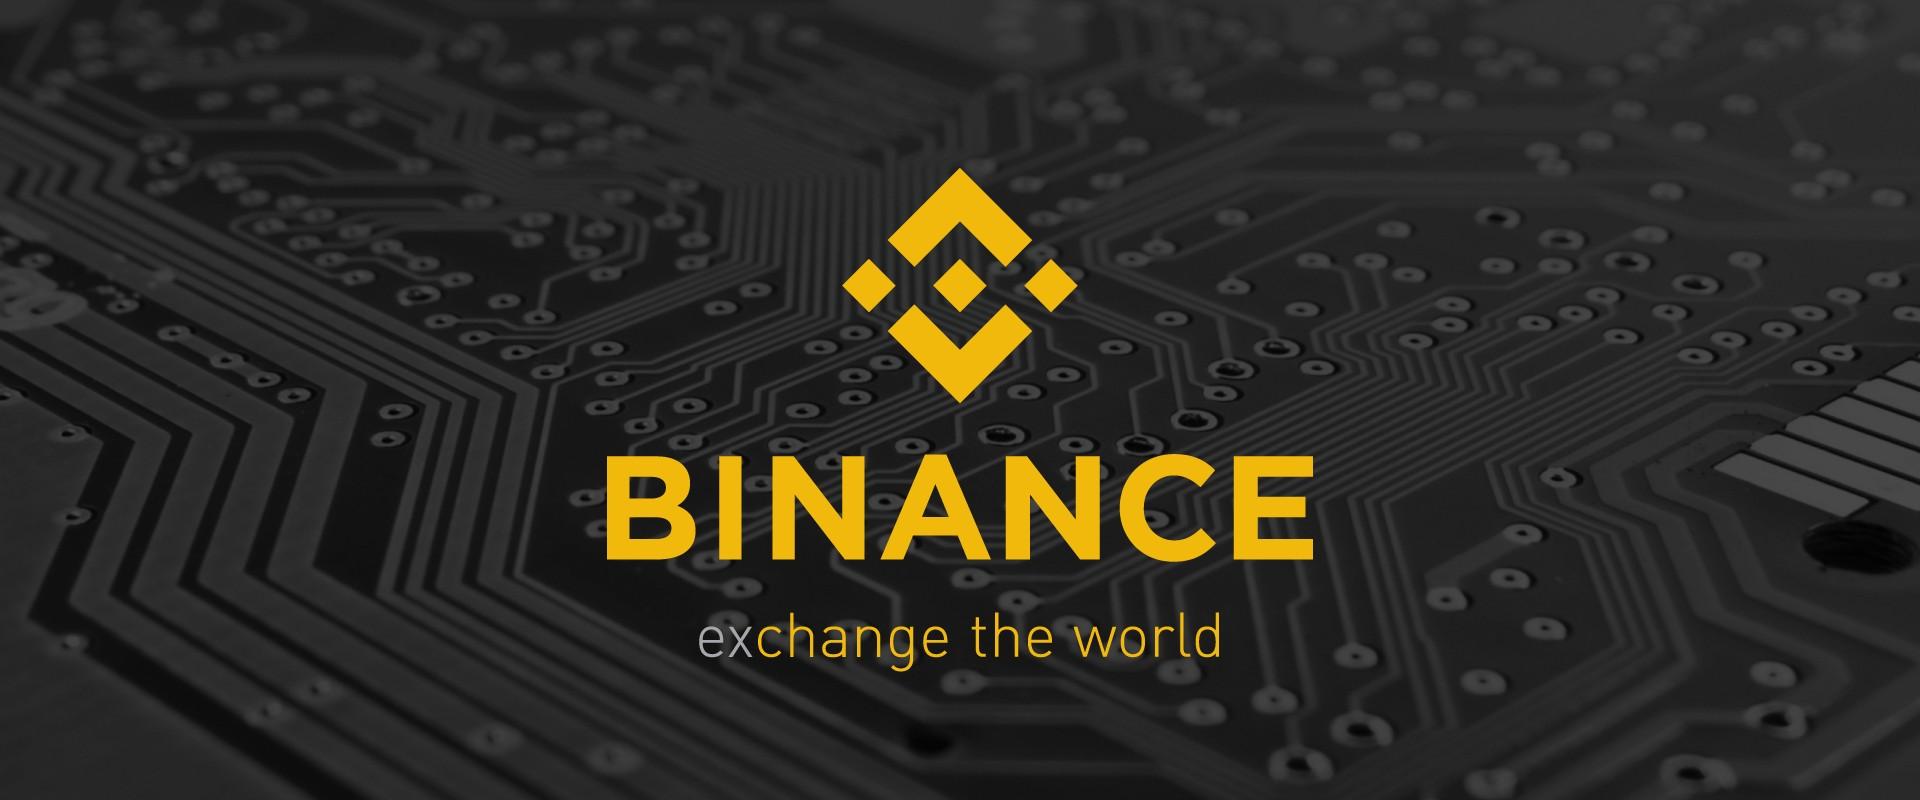 BNB主网转换启动,DEX上币随之到来,币安开启交易所新生态